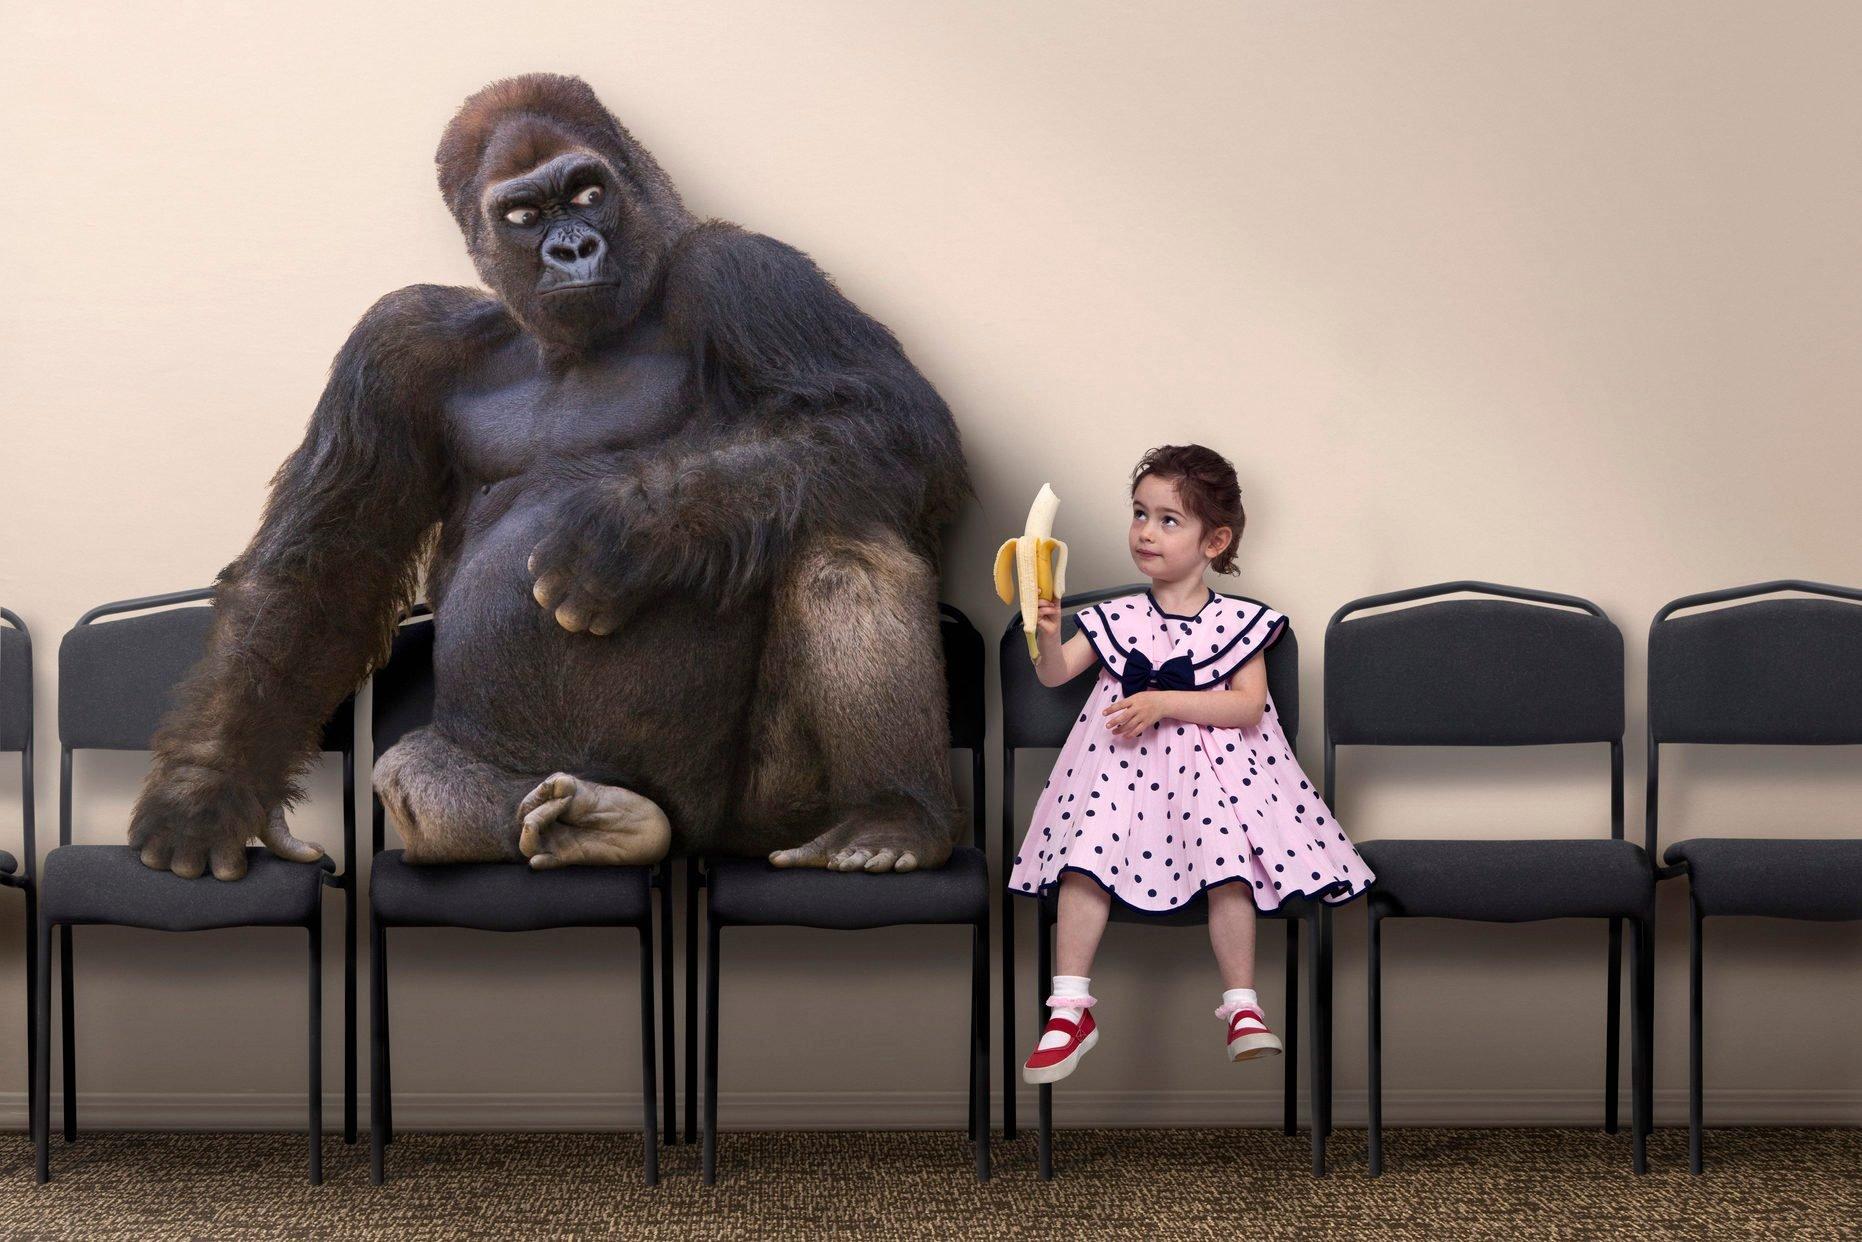 Caucasian girl offering banana to gorilla